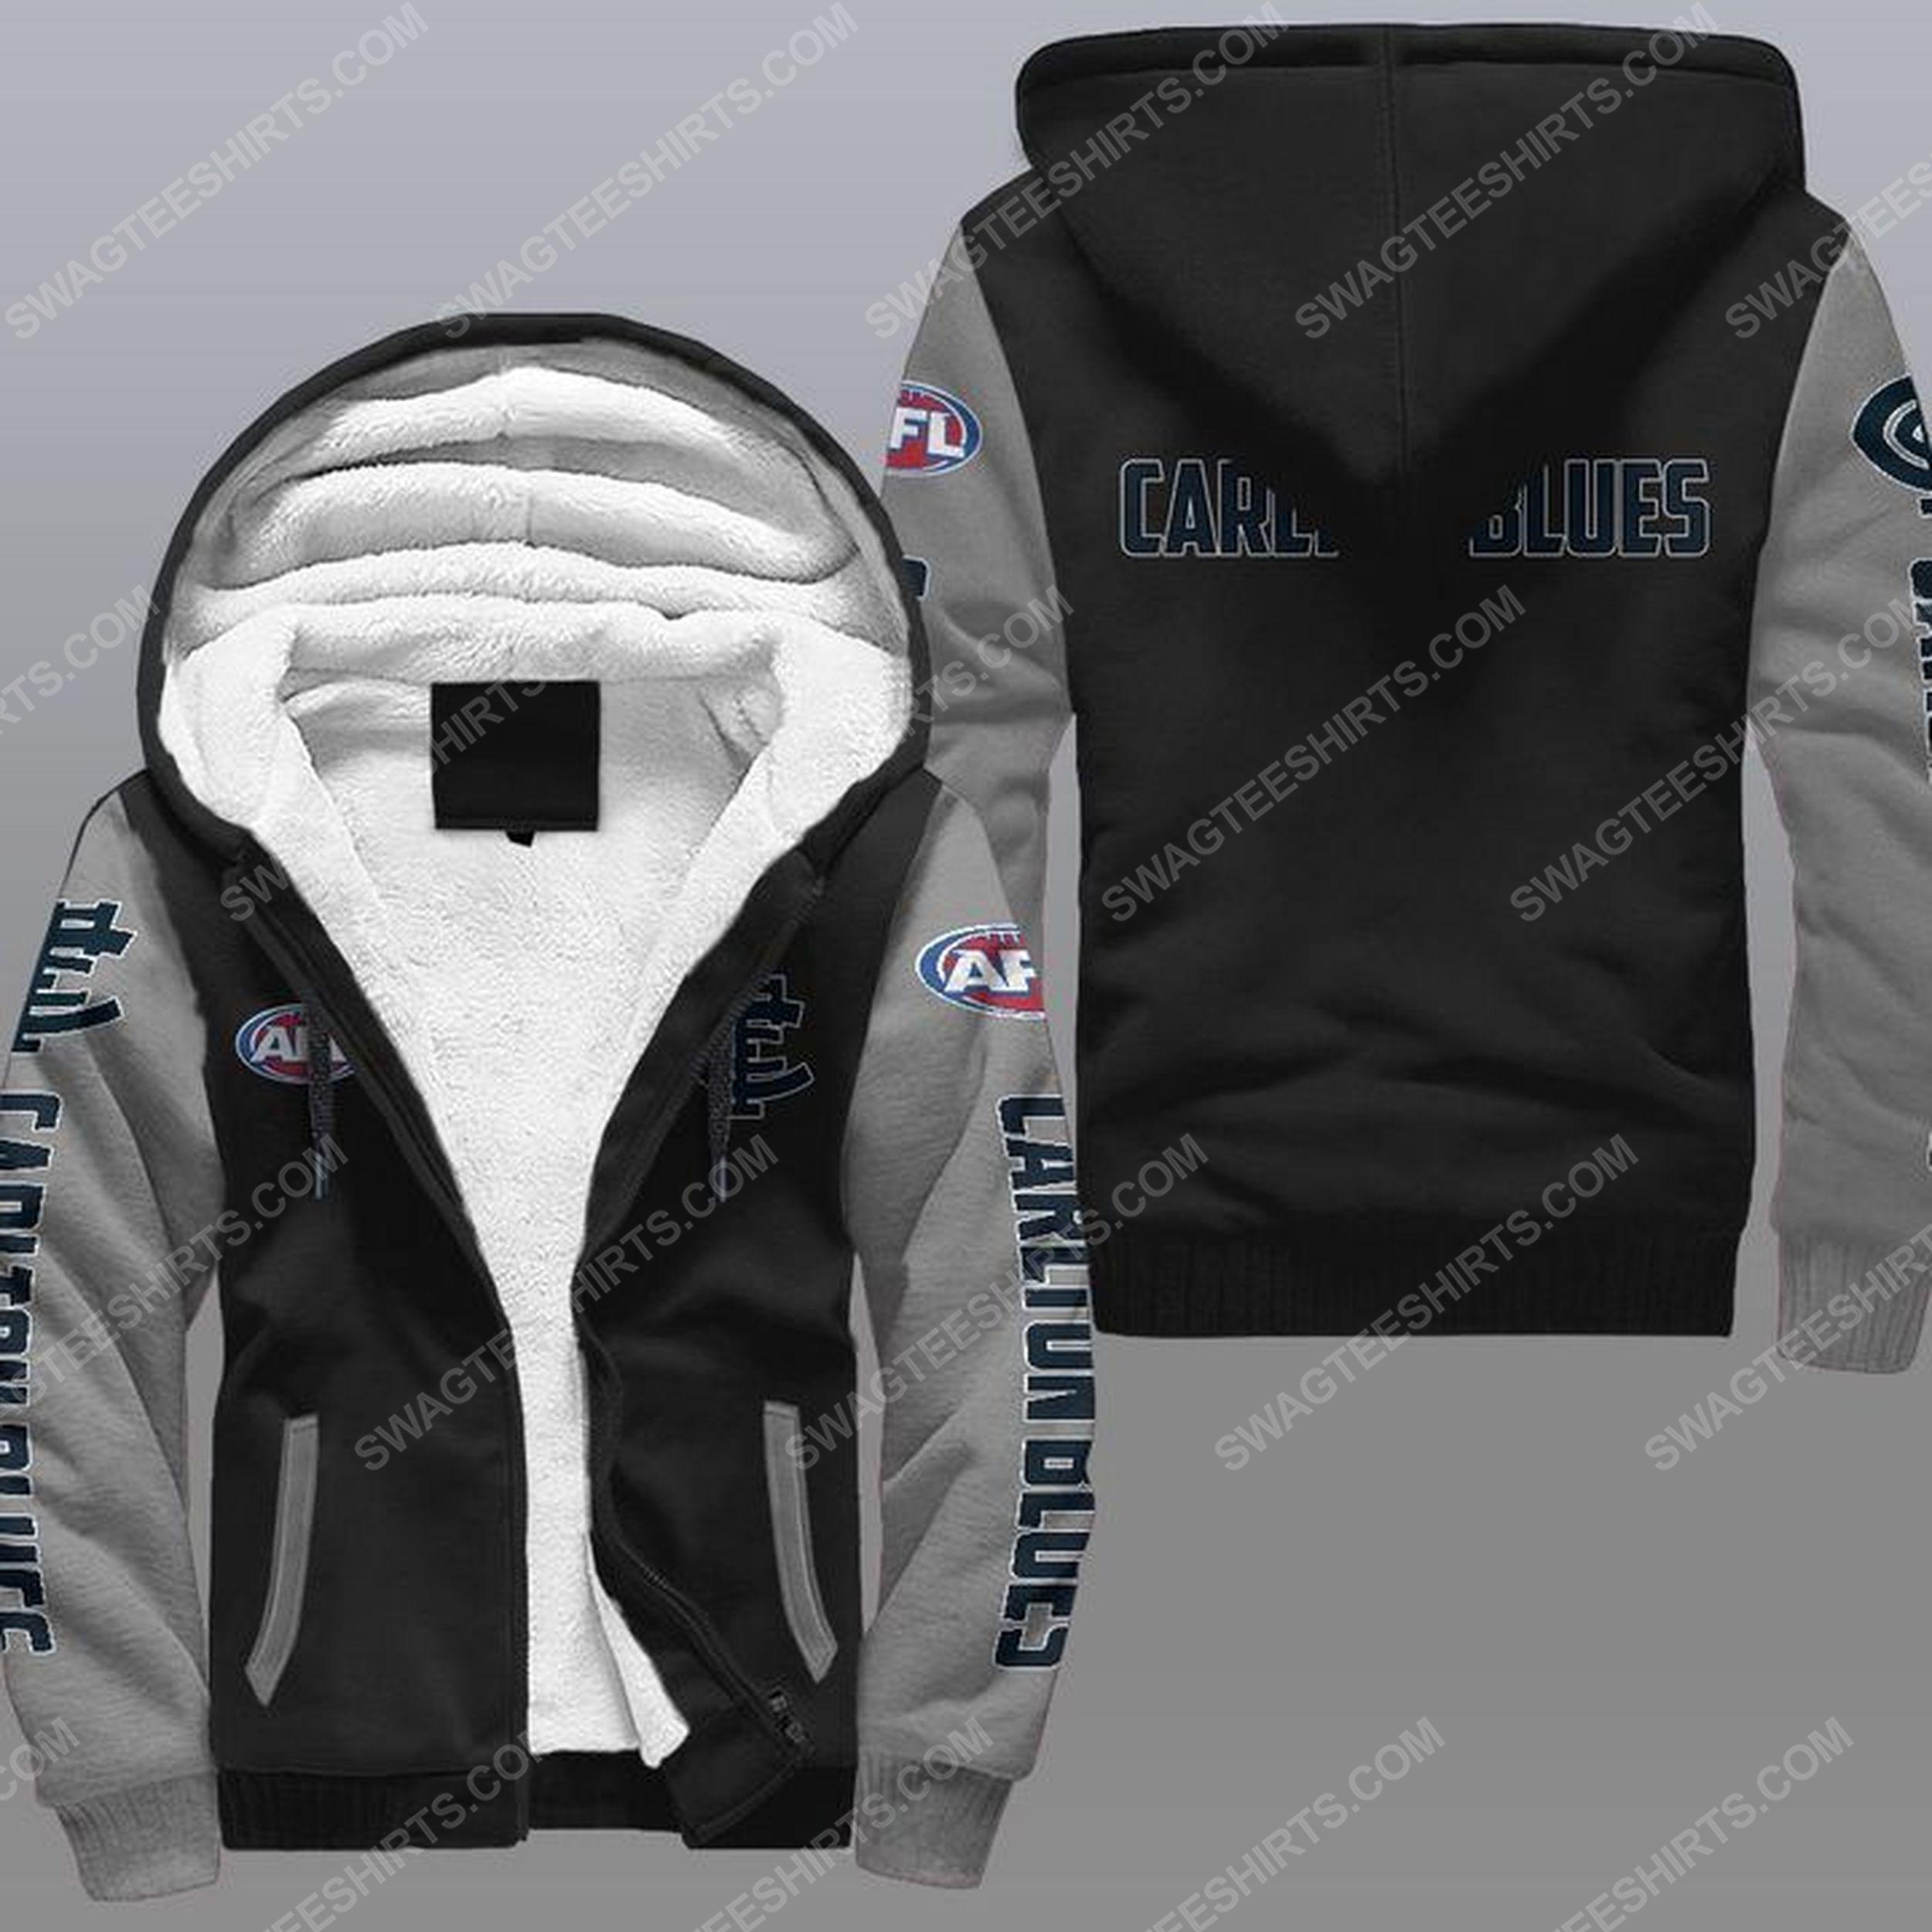 The carlton football club all over print fleece hoodie - gray 1